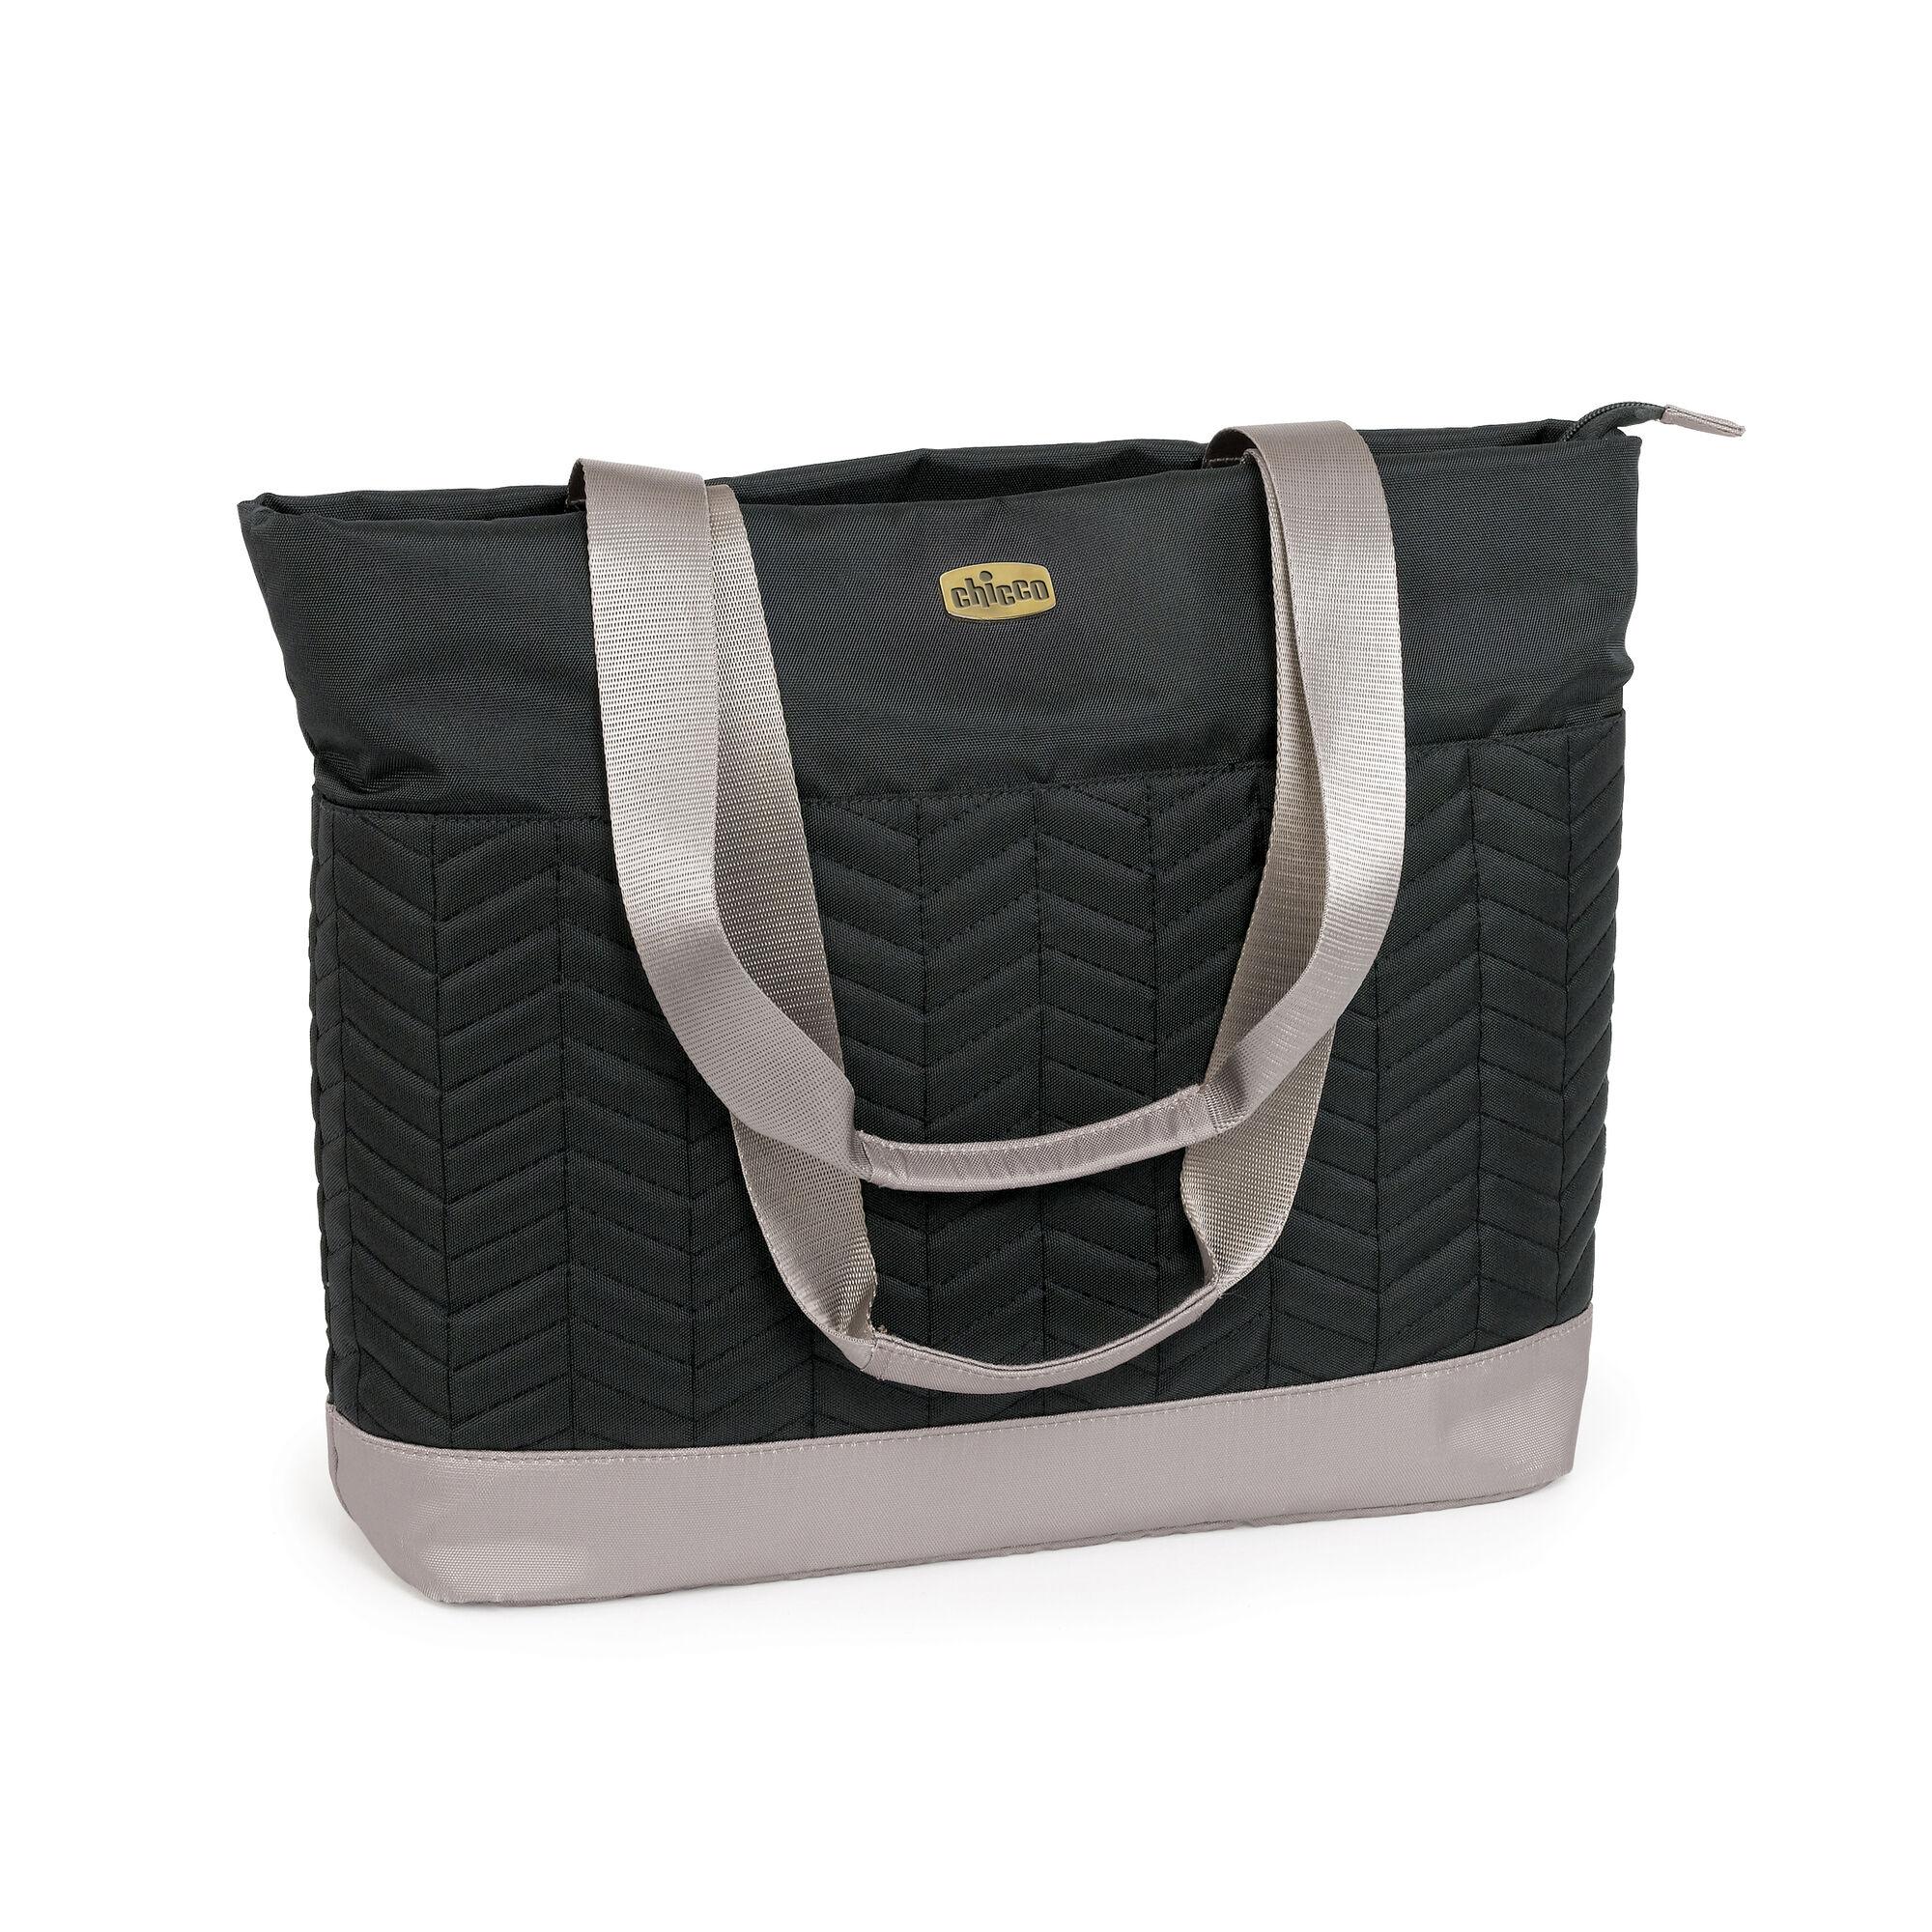 chevron tote bag black. Black Bedroom Furniture Sets. Home Design Ideas